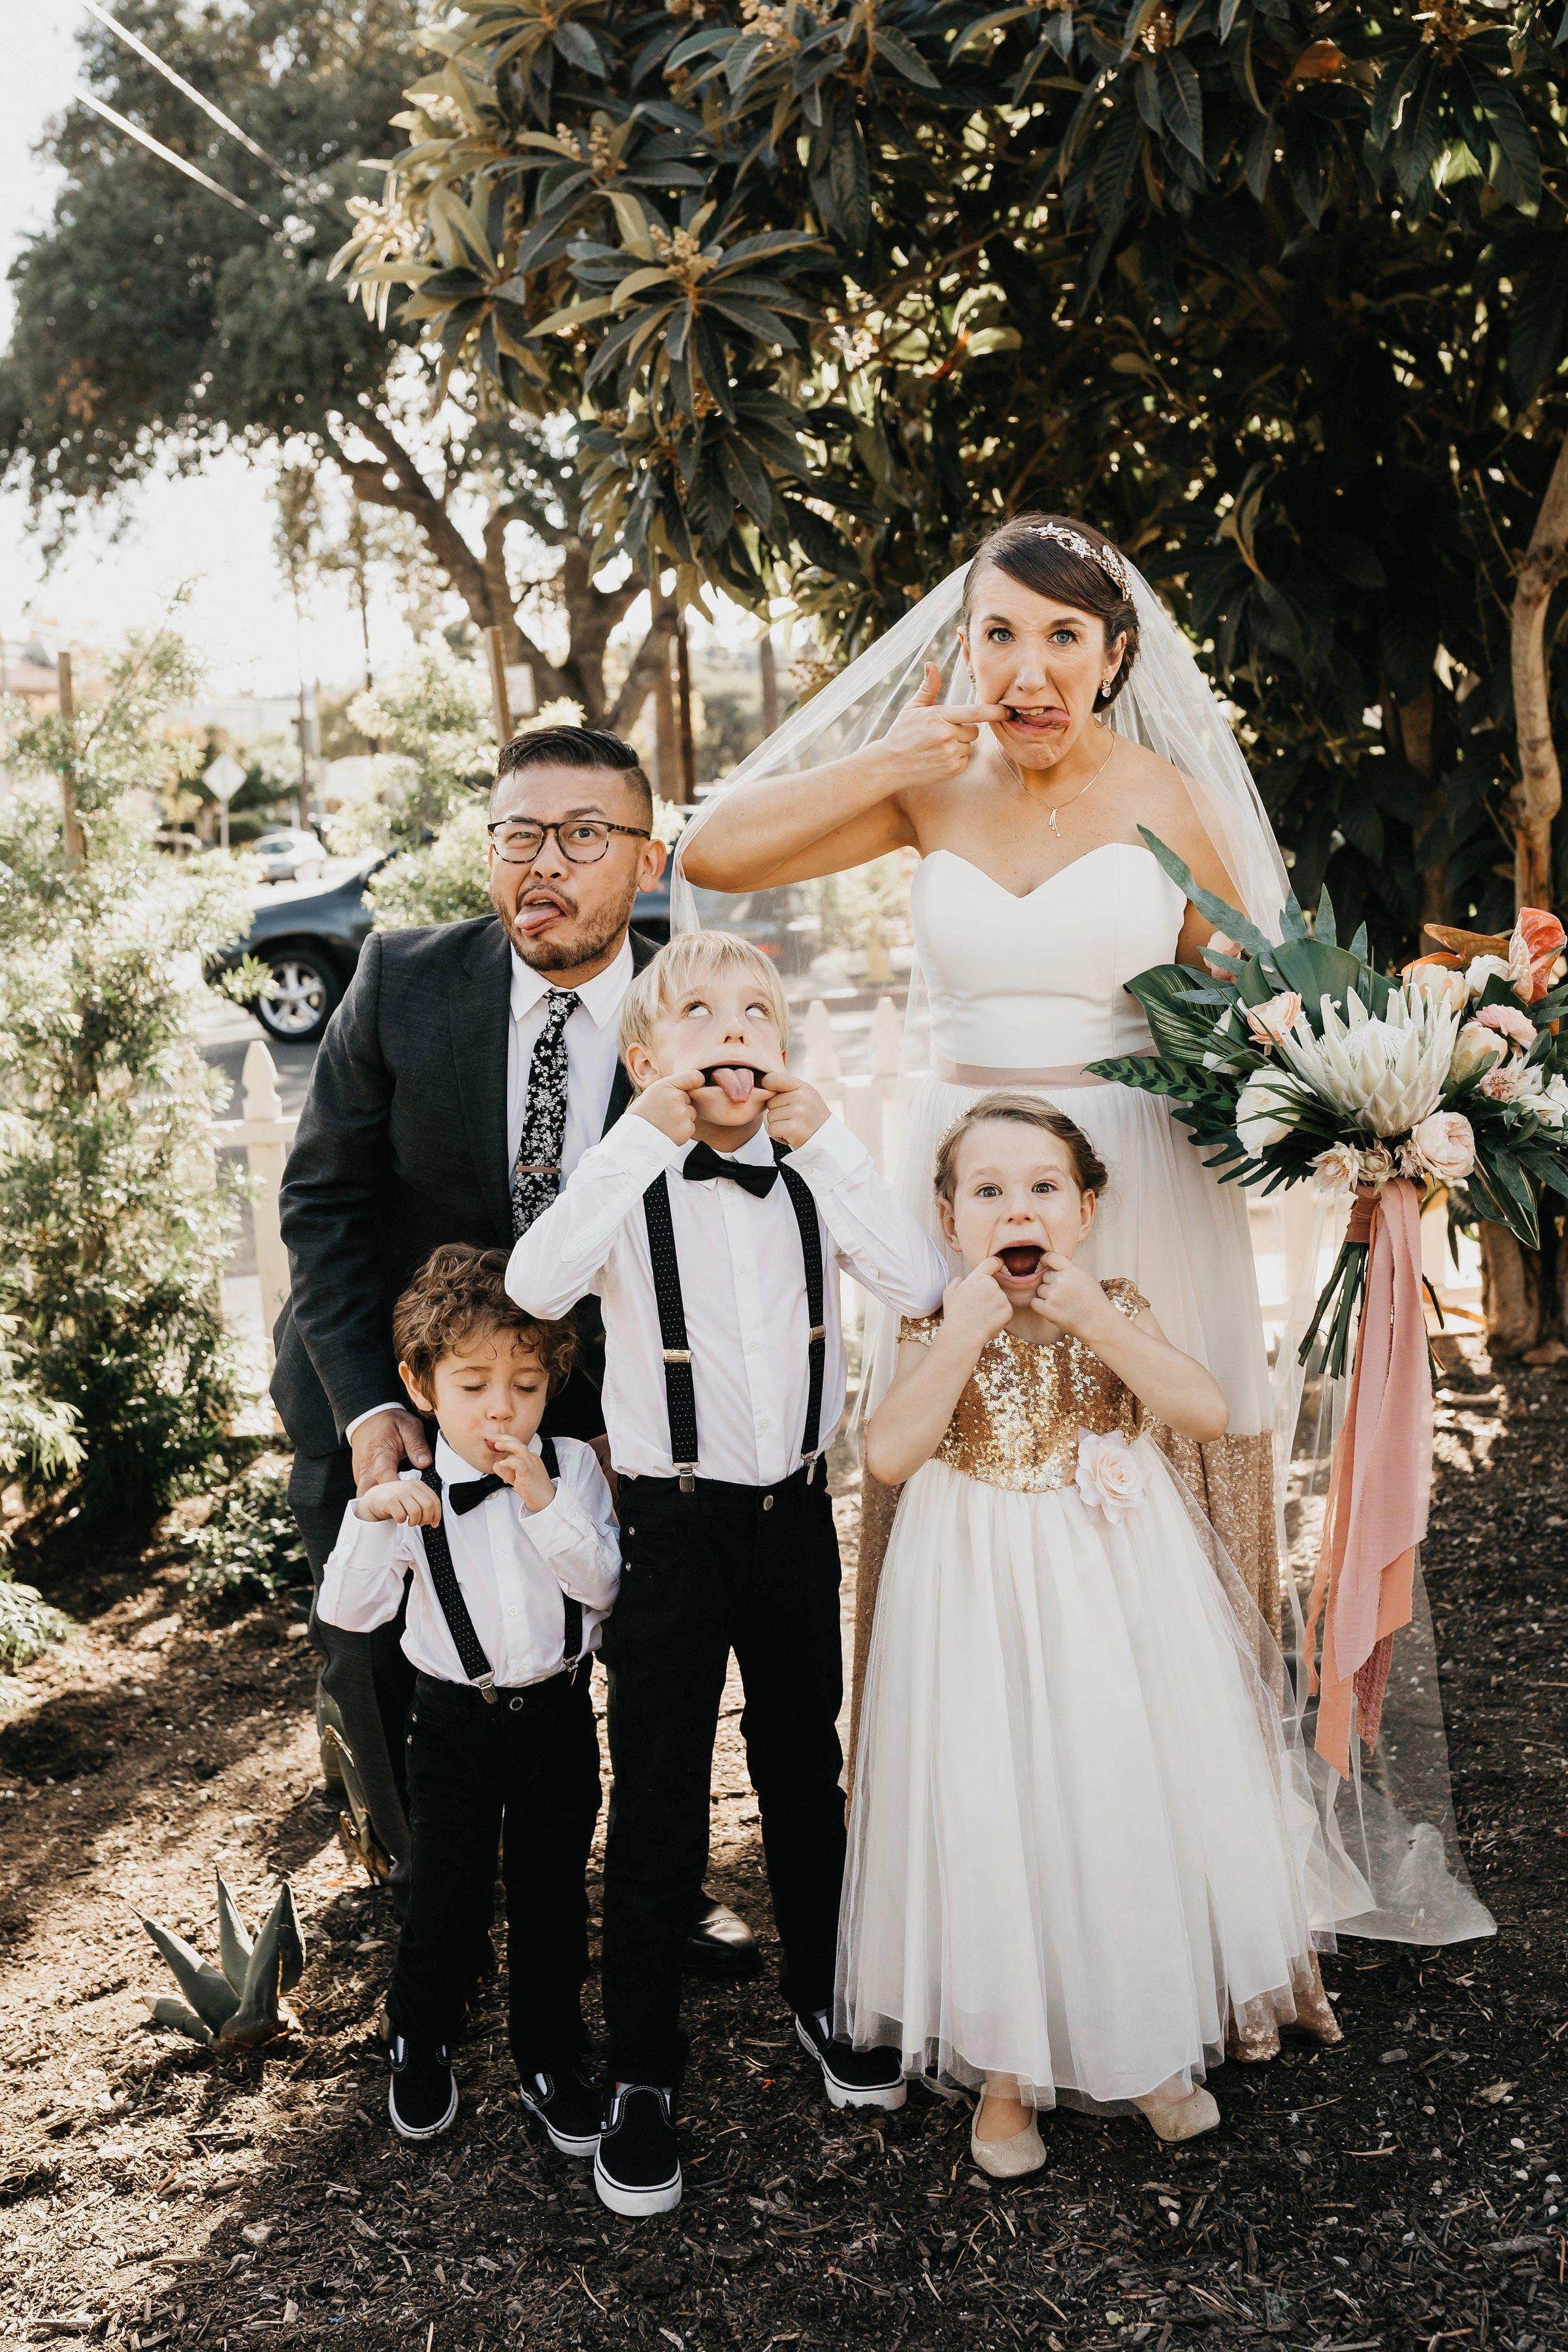 colleen pip wedding kids